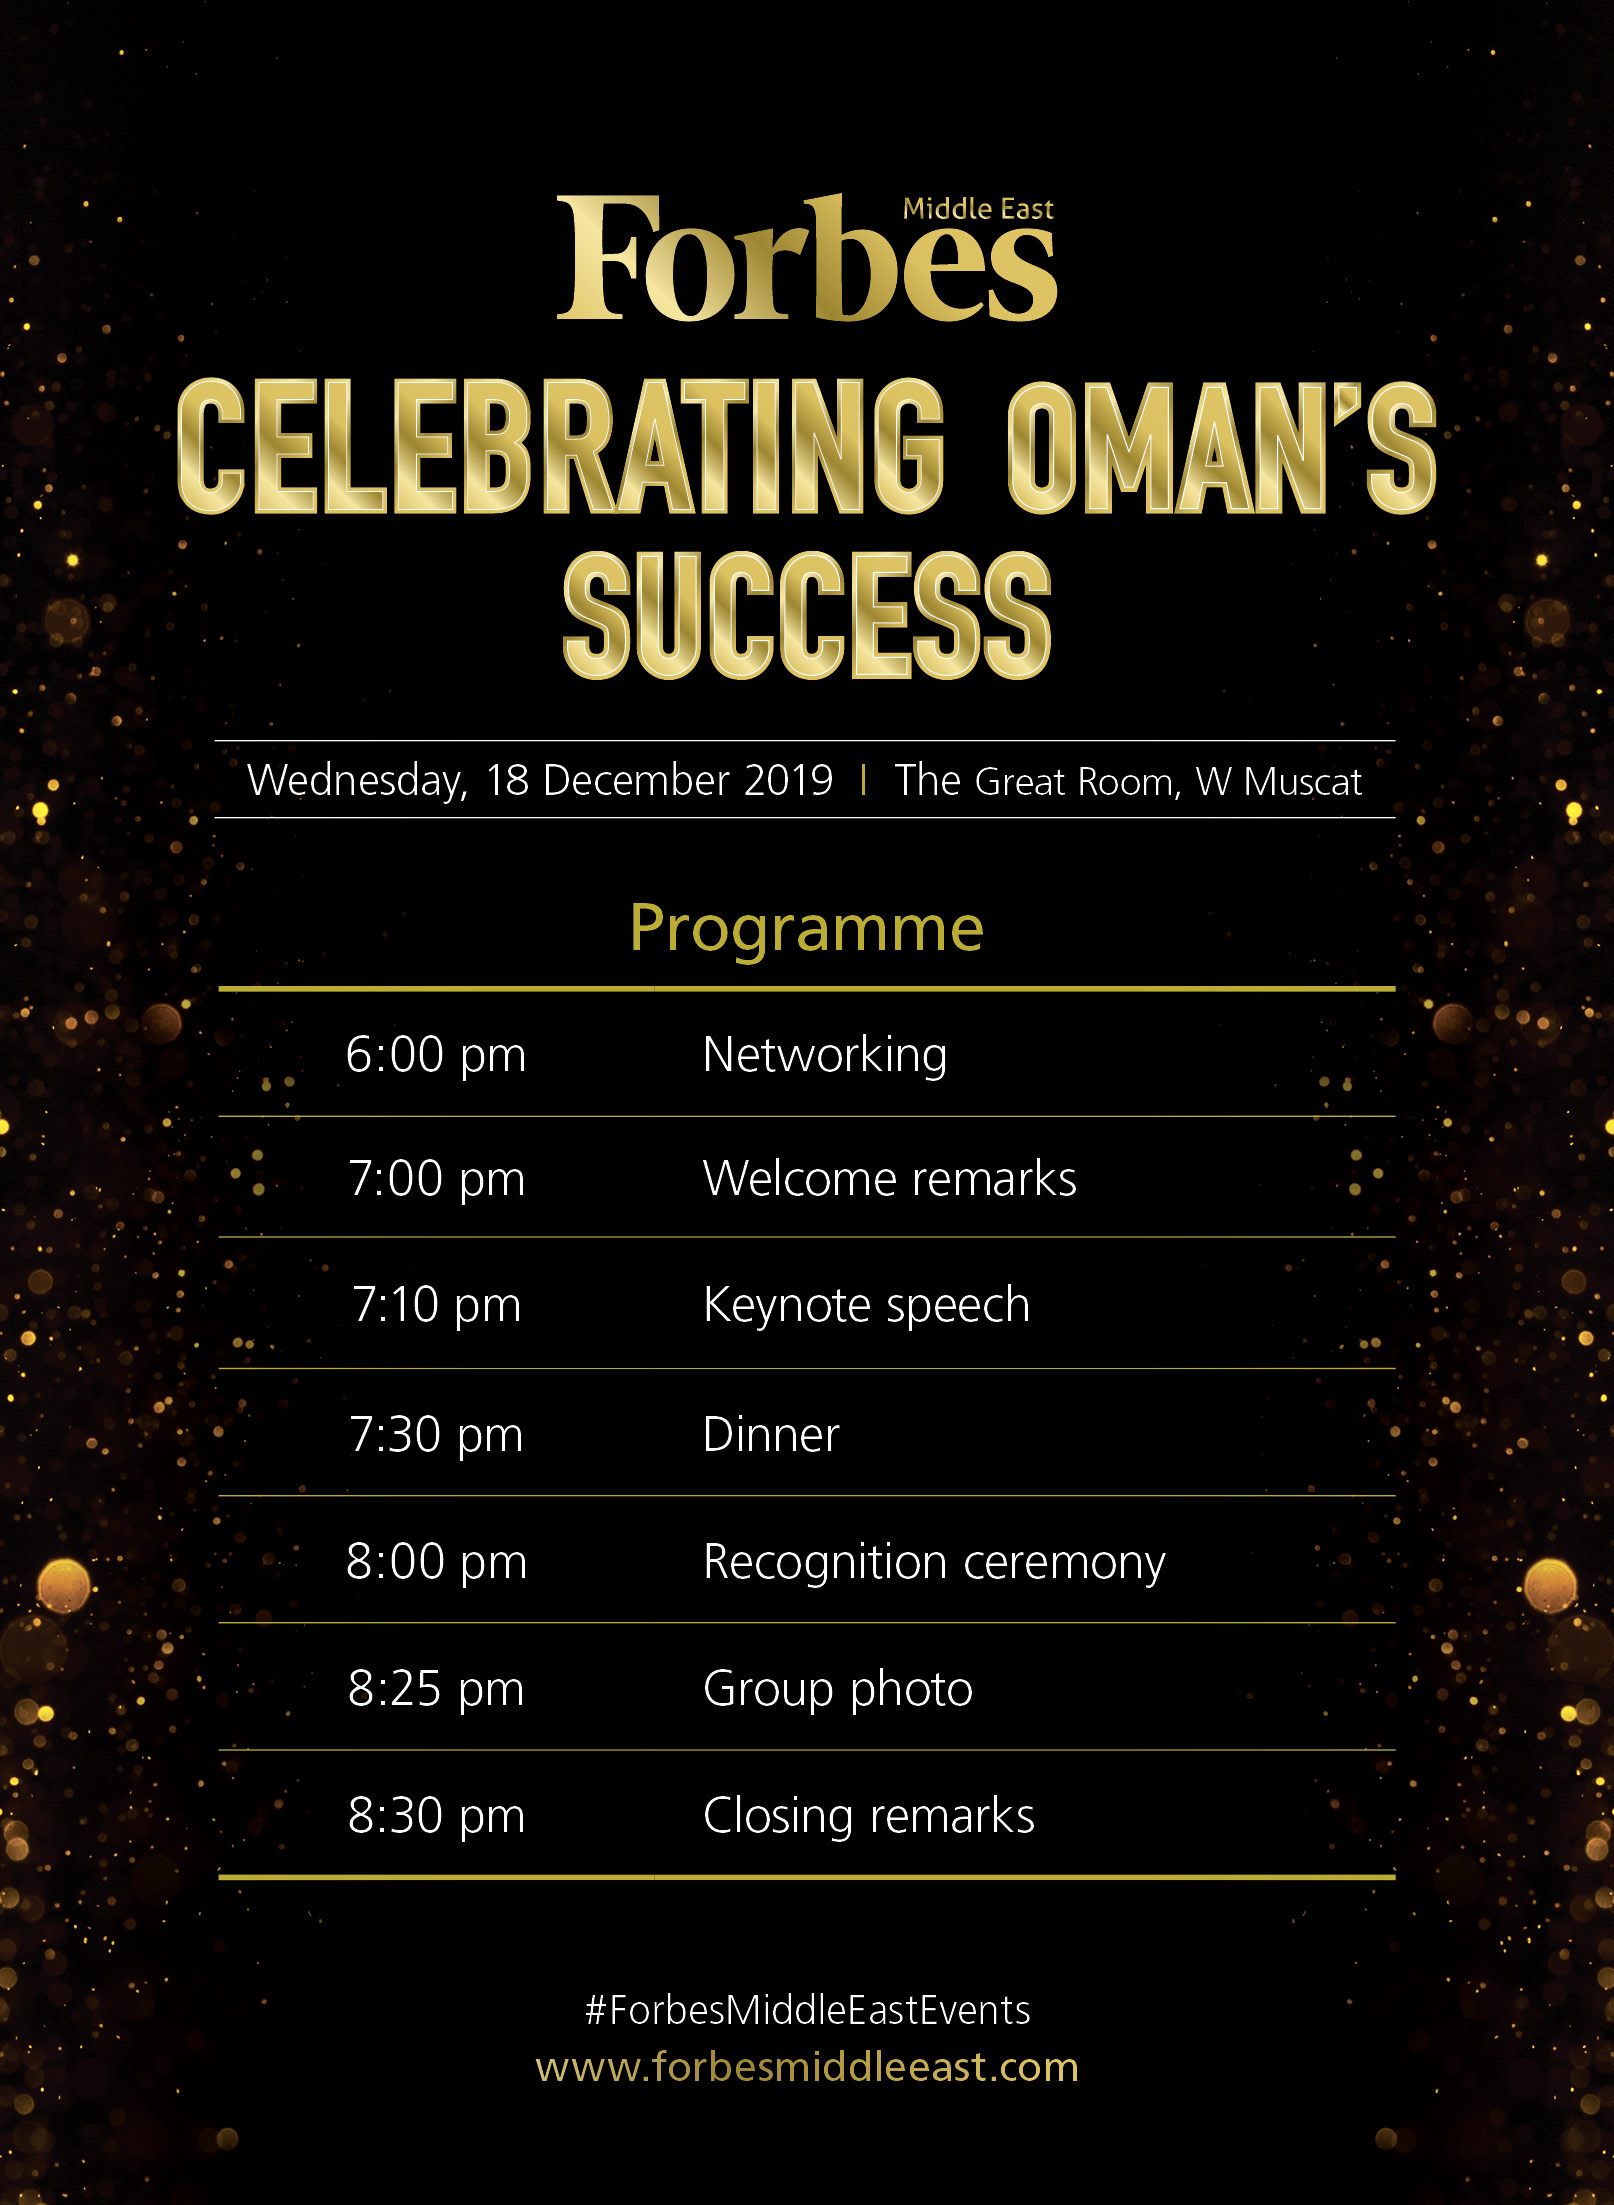 Agenda - Celebrating Oman's Success